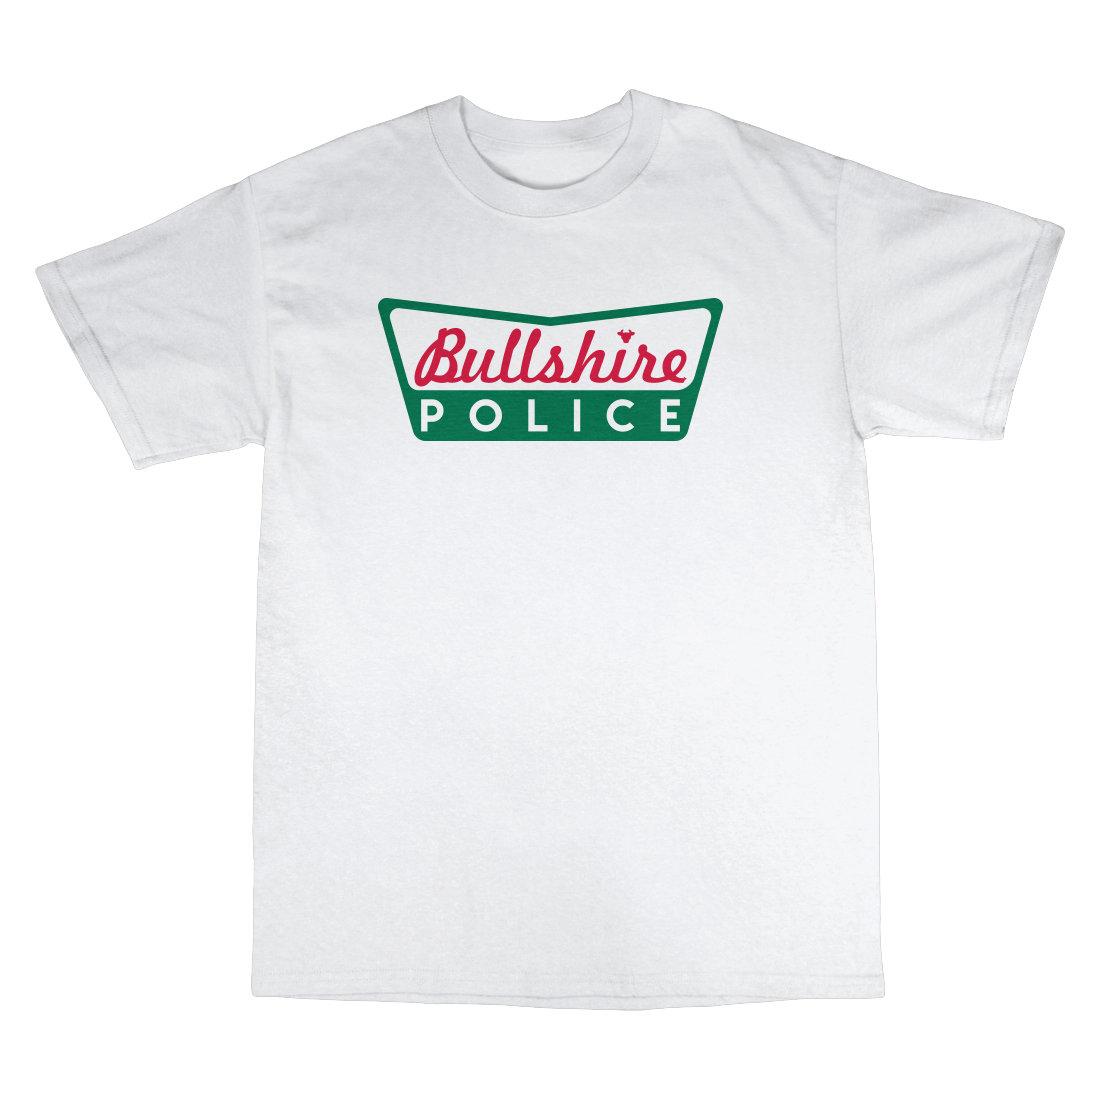 Unisex 'Krispy Bullshire' T-Shirt KrispyBullshireTEE